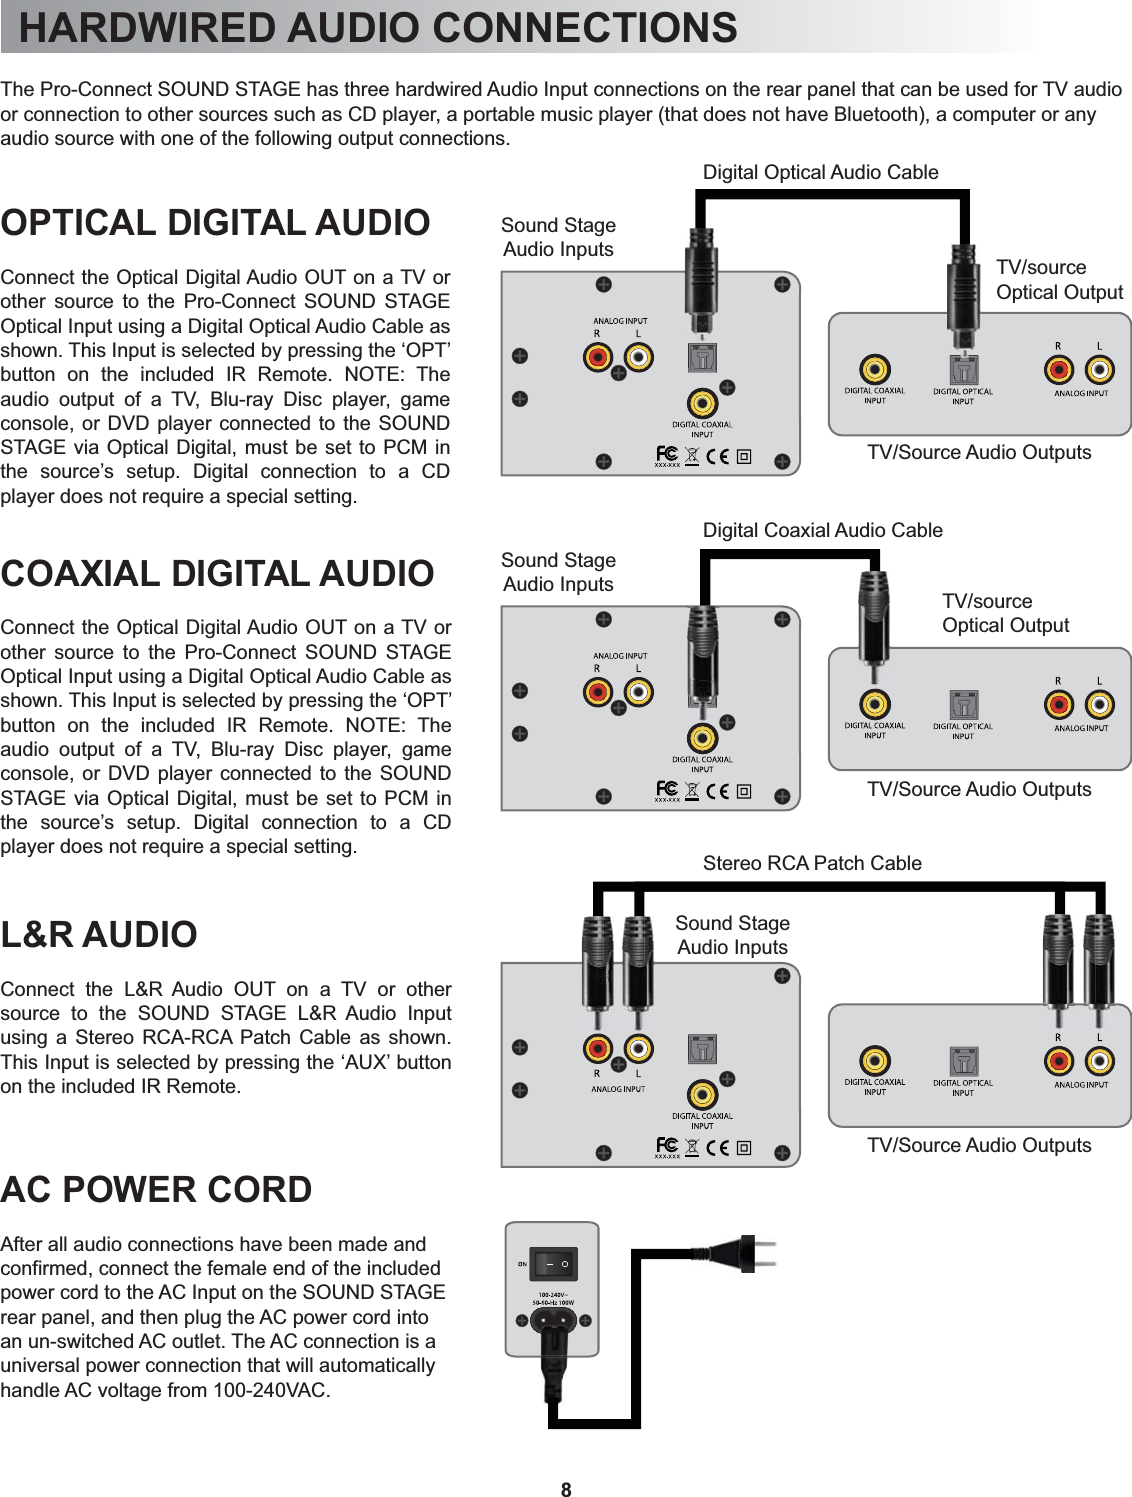 OSD Audio JAPC Sound Platform / Sound Stage User Manual 1